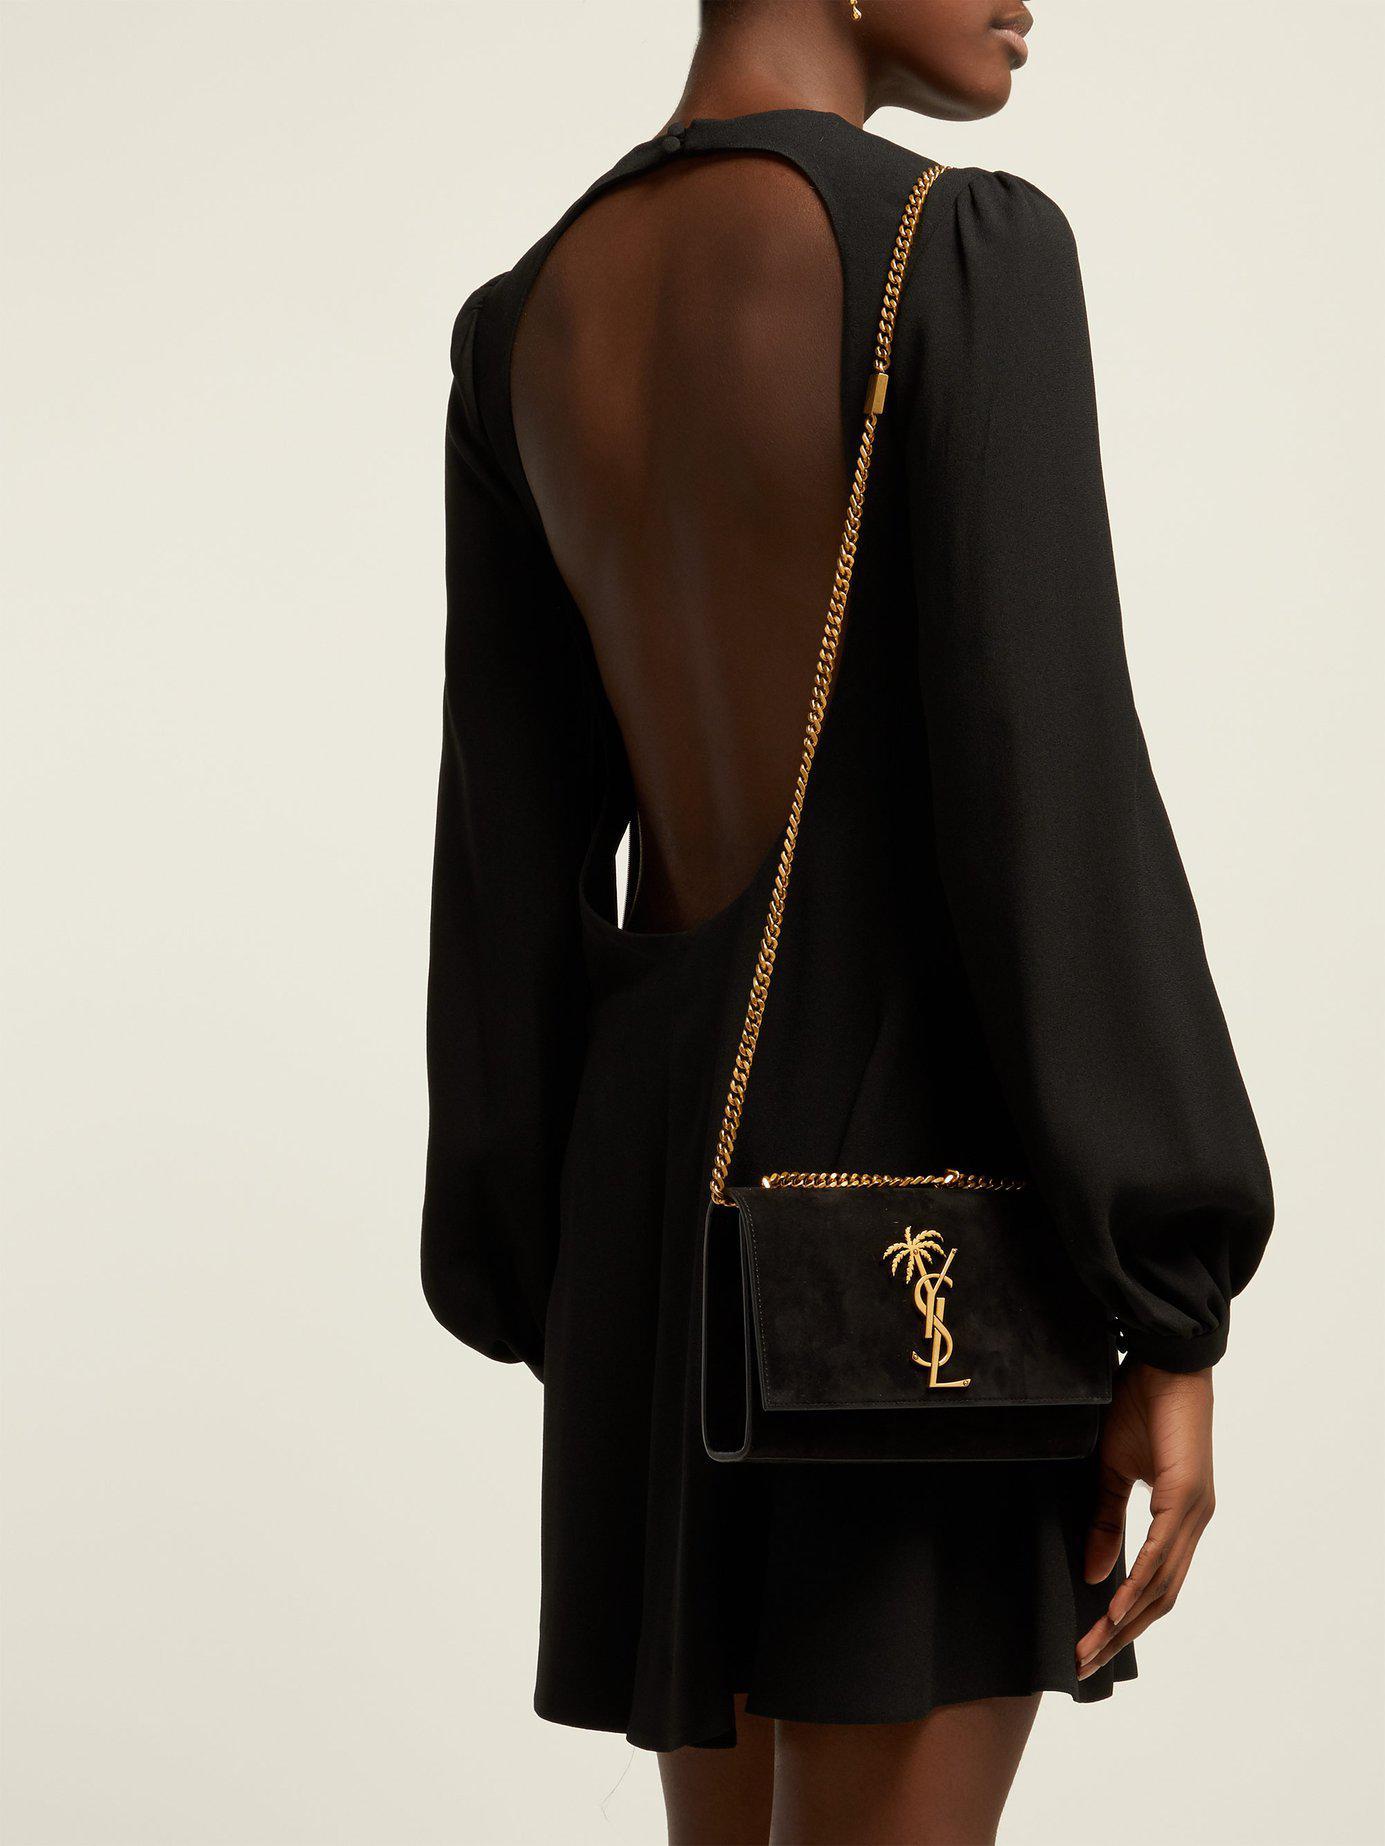 a4e43c3a8269 Saint Laurent - Black Small Kate Velvet Shoulder Bag - Lyst. View fullscreen